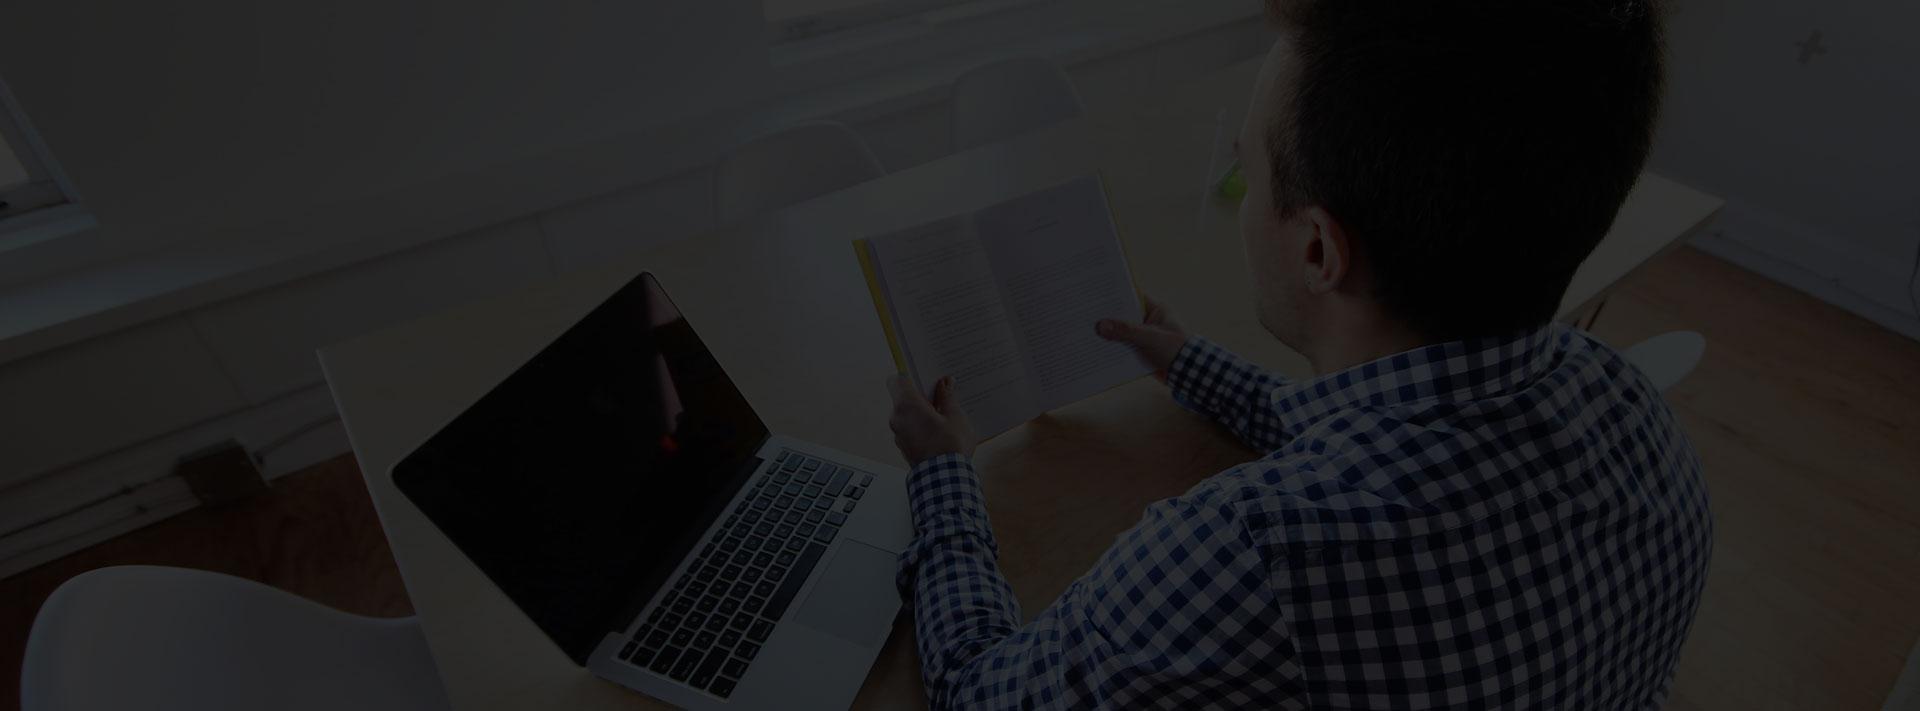 Web Development Smach Solutions